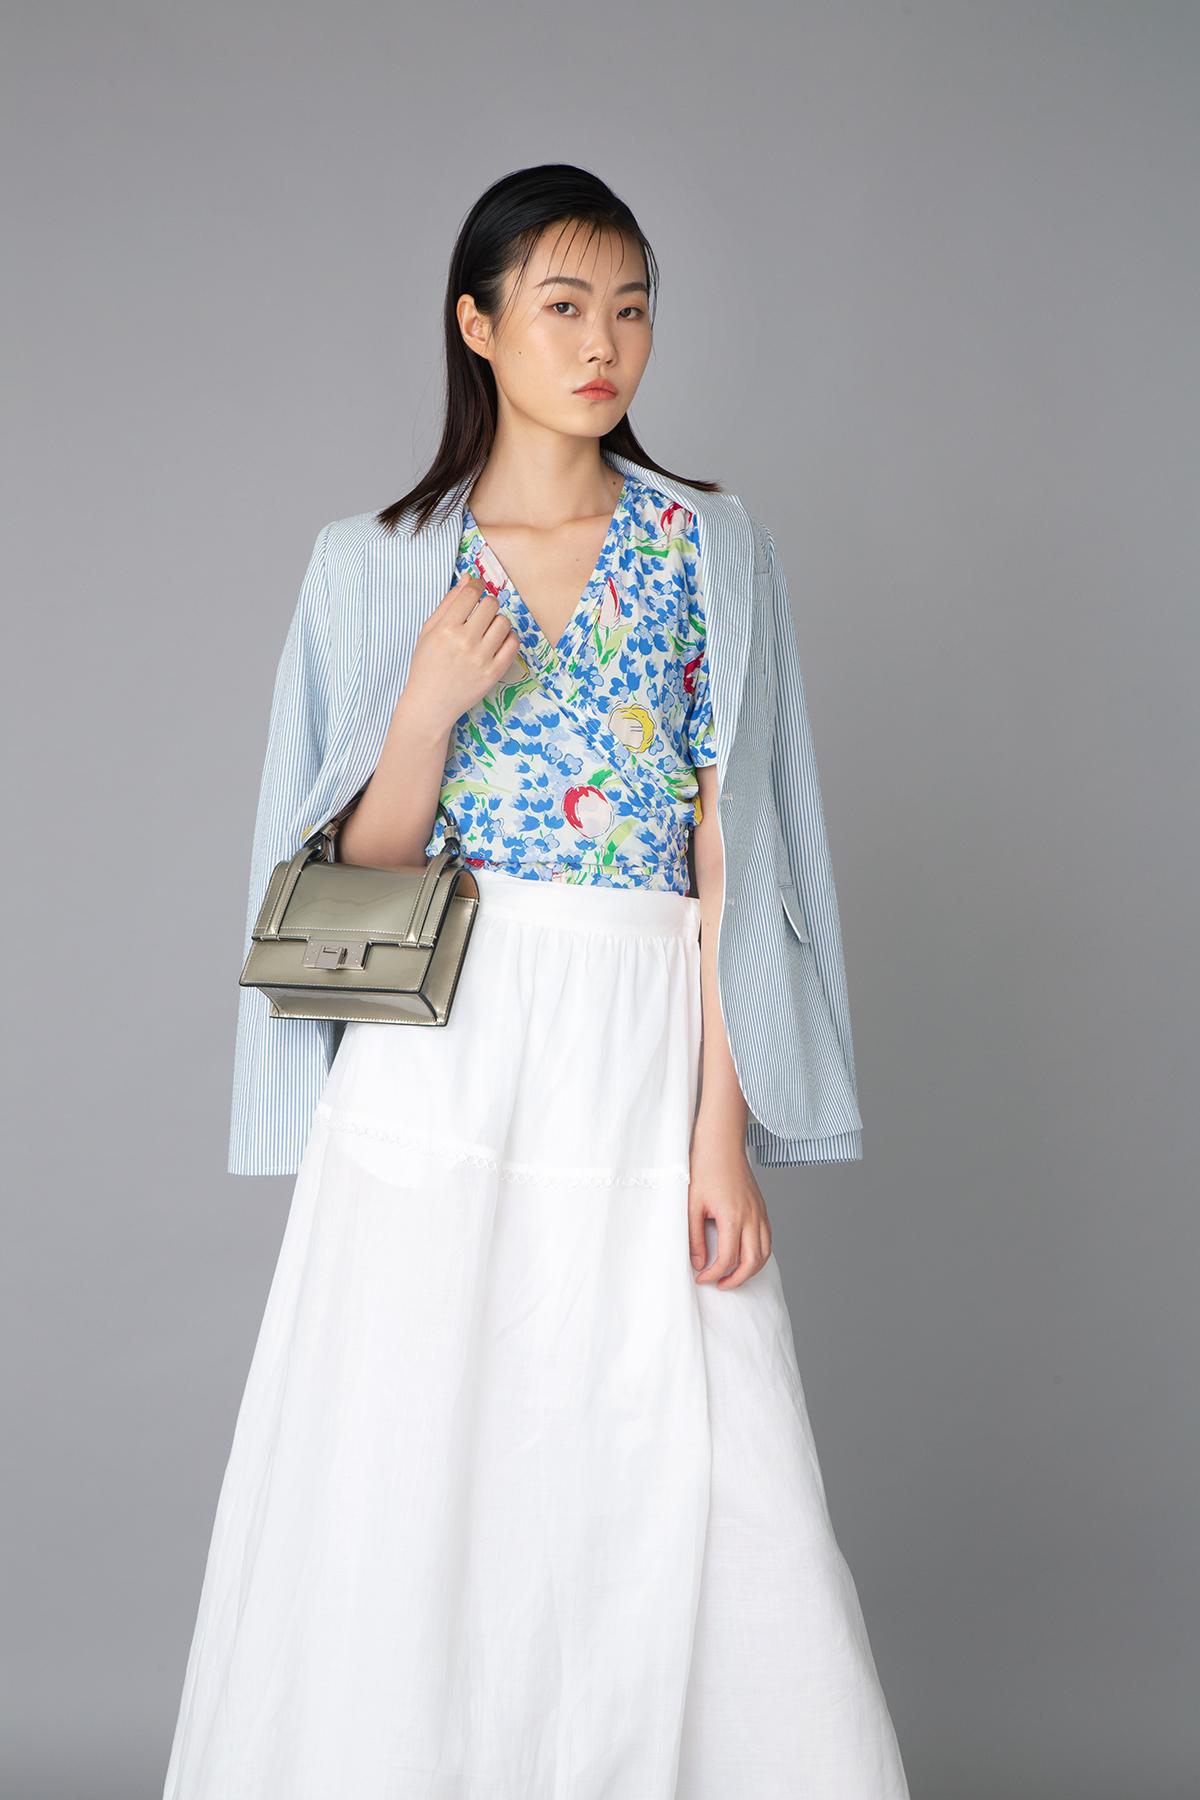 Polo Ralph Lauren blue floral printed shirt $1,990 ,blue blazer $3,990 and small leather handbag $13,300 Max Mara white dress $4,580